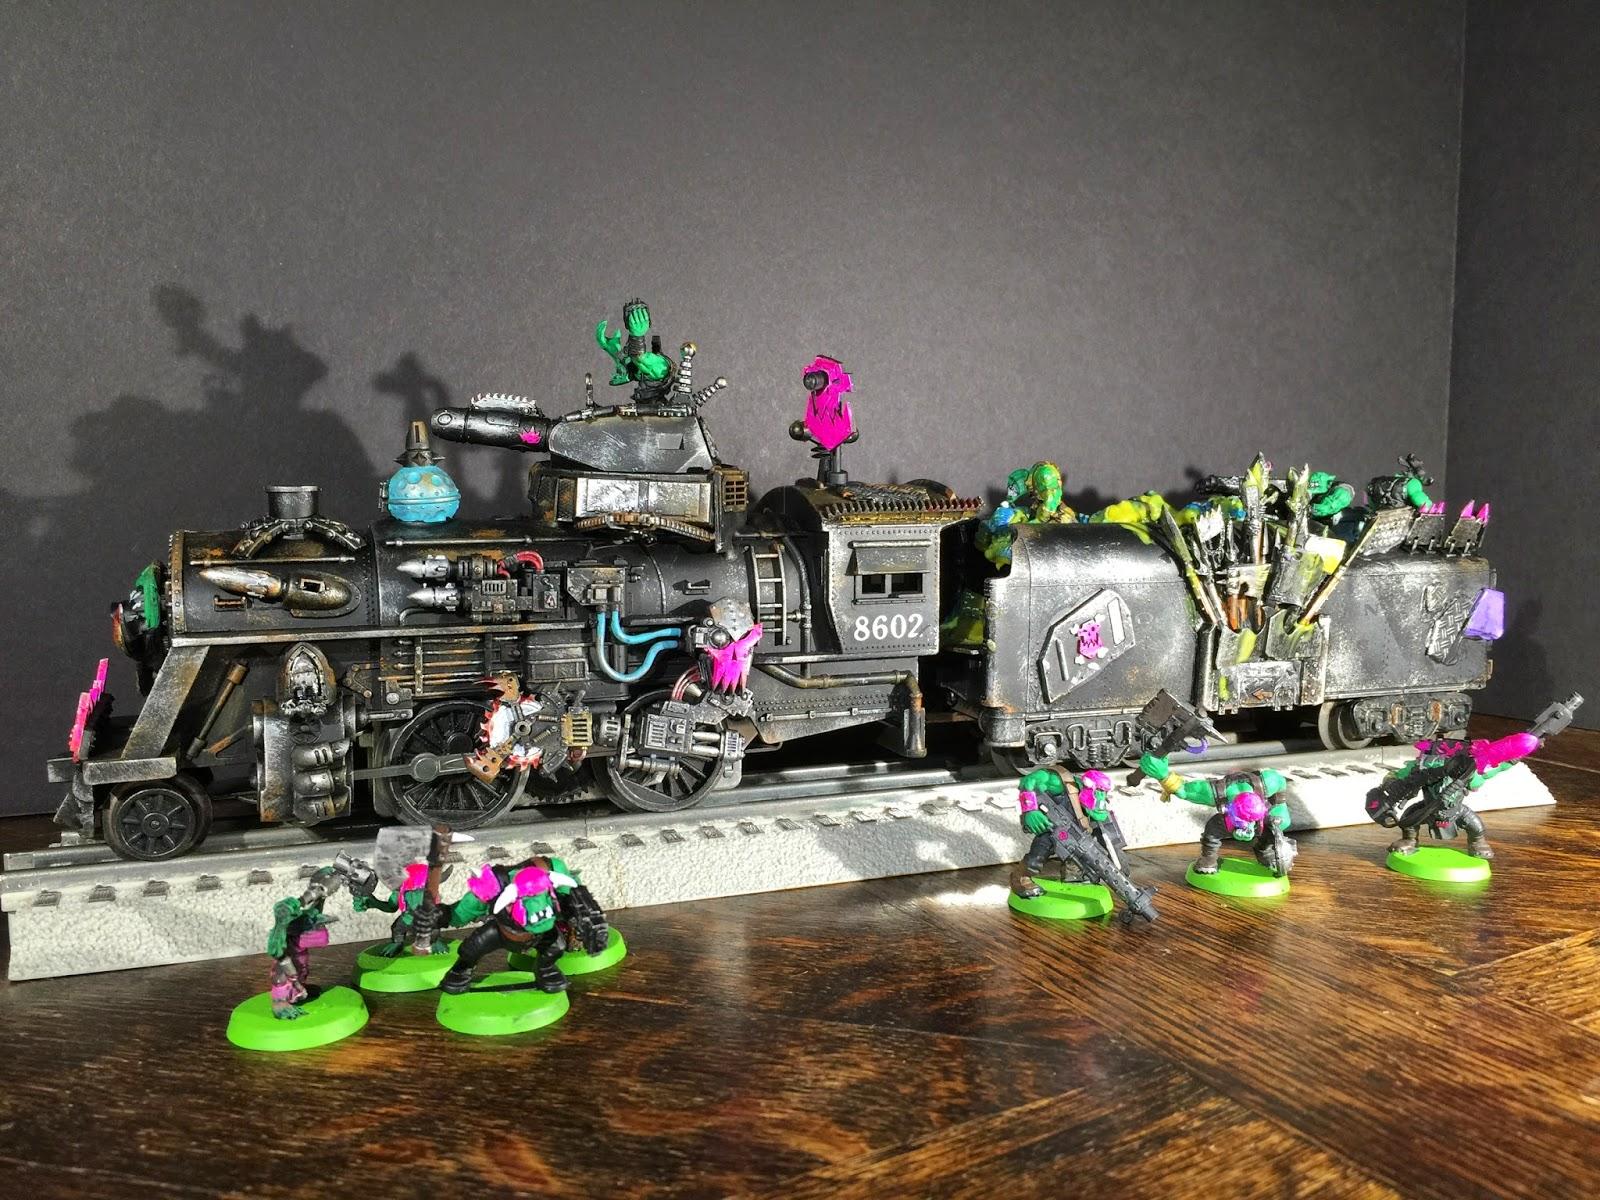 Ork Train; Pink Orks Train; Dakka Chugga; Ork Looted Wagon; Tyranid Fuel; Battle Gaming One